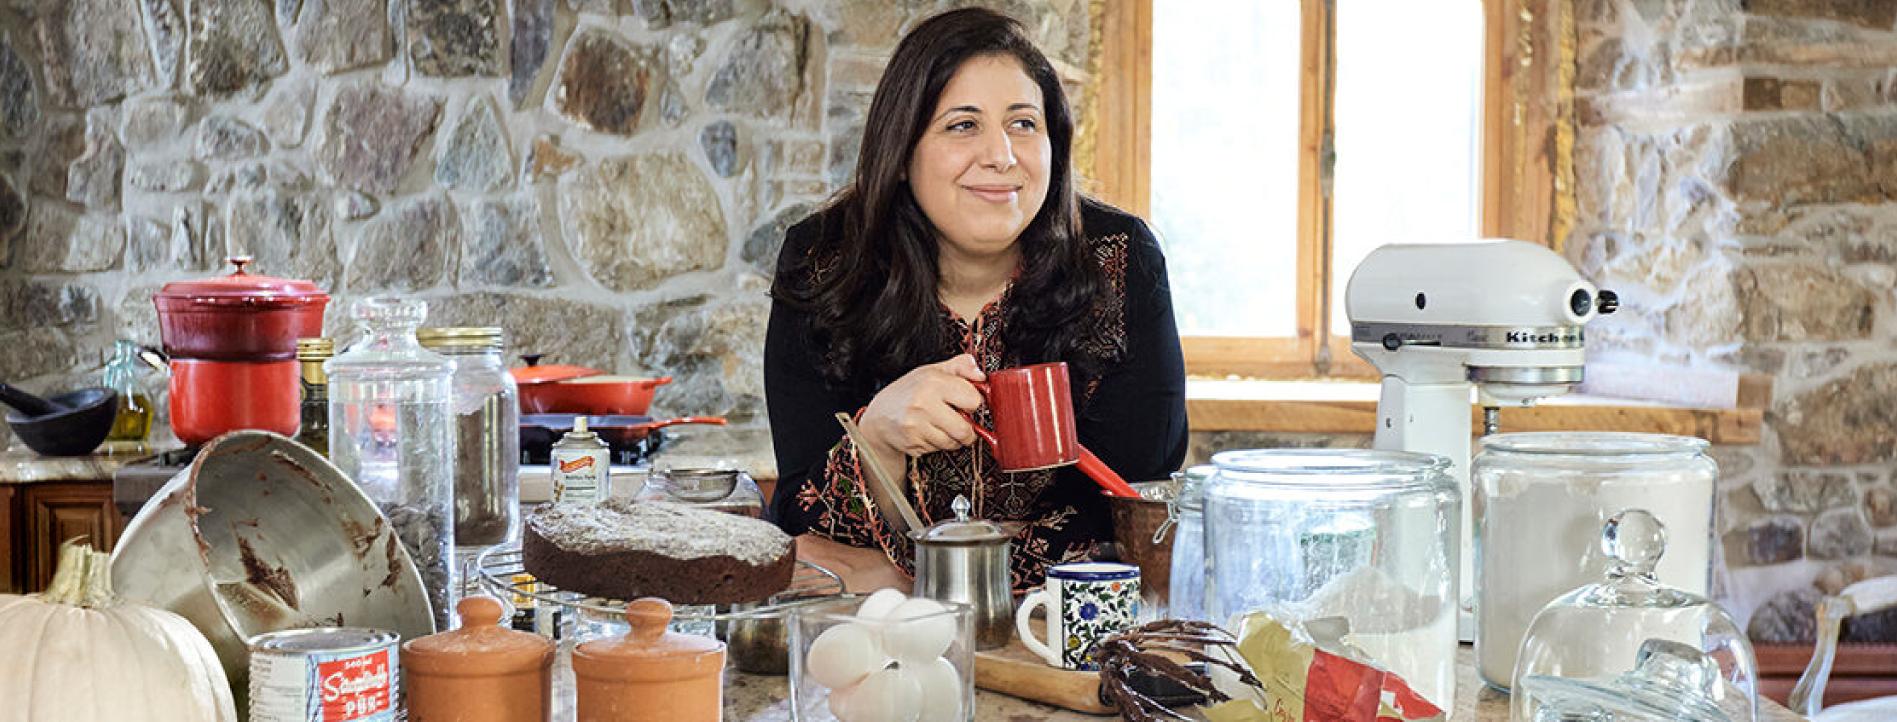 Mayada Elsabbagh in the kitchen